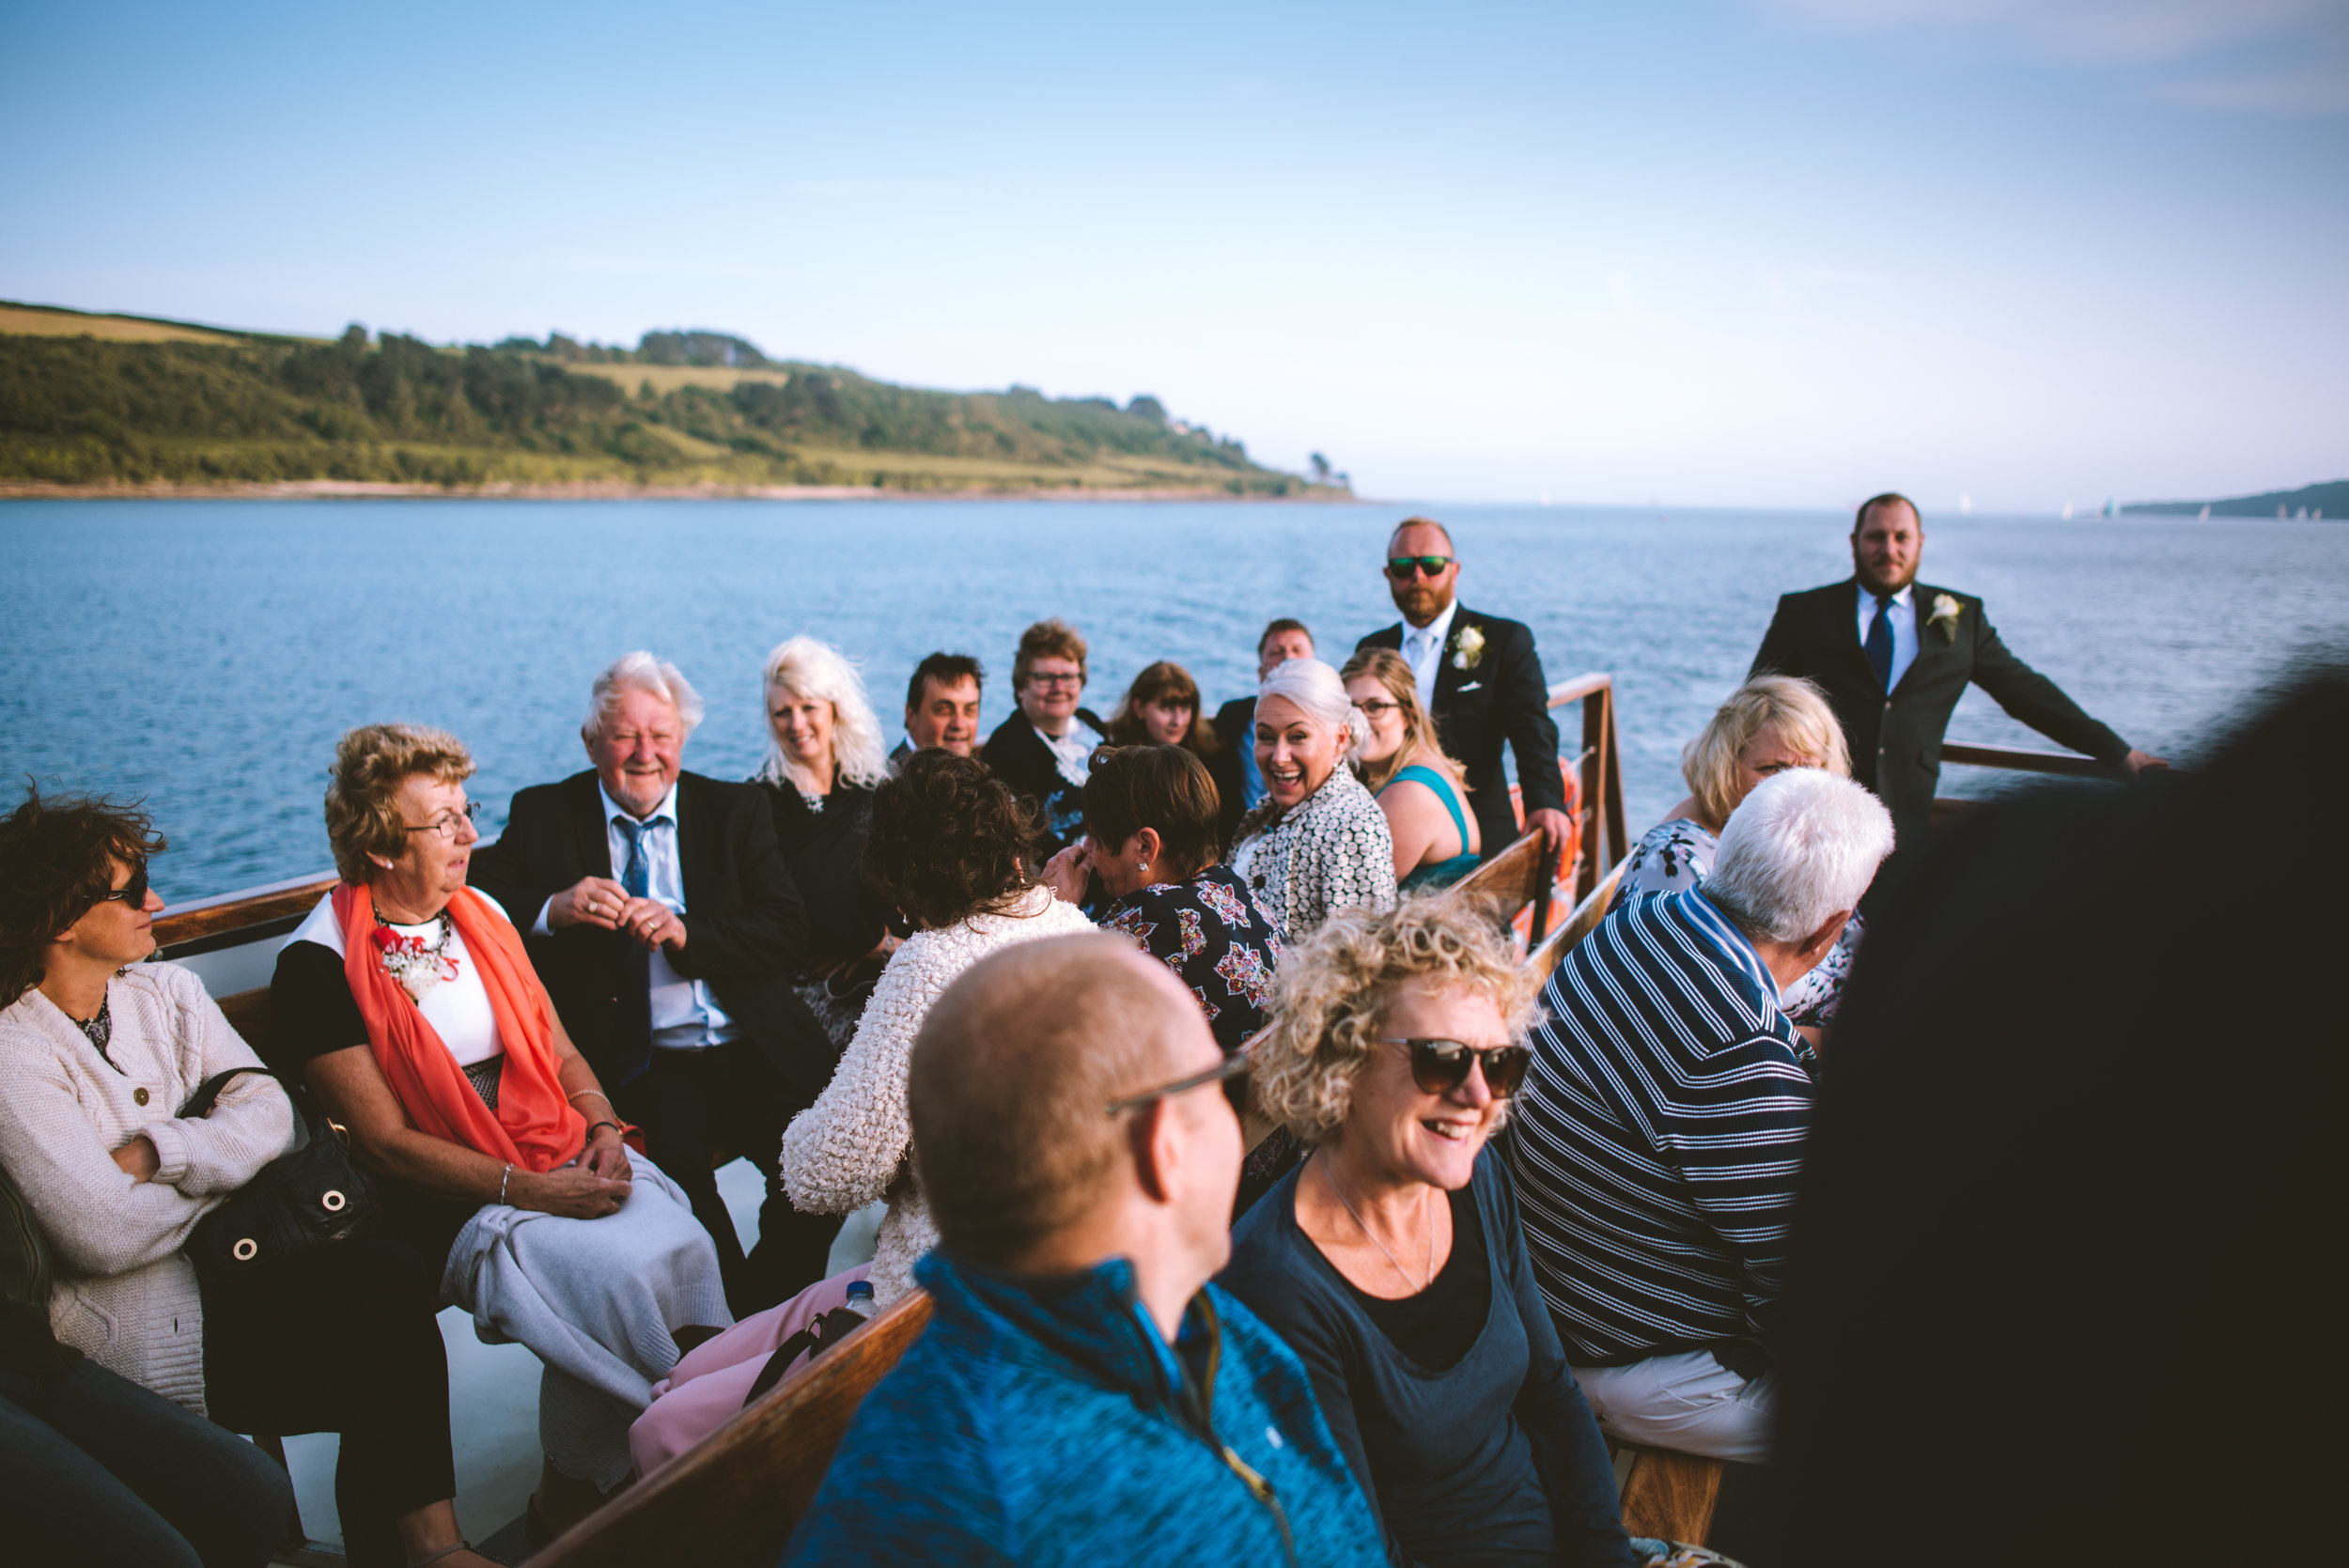 wedding-photographer-falmouth-greenbank-54.jpg